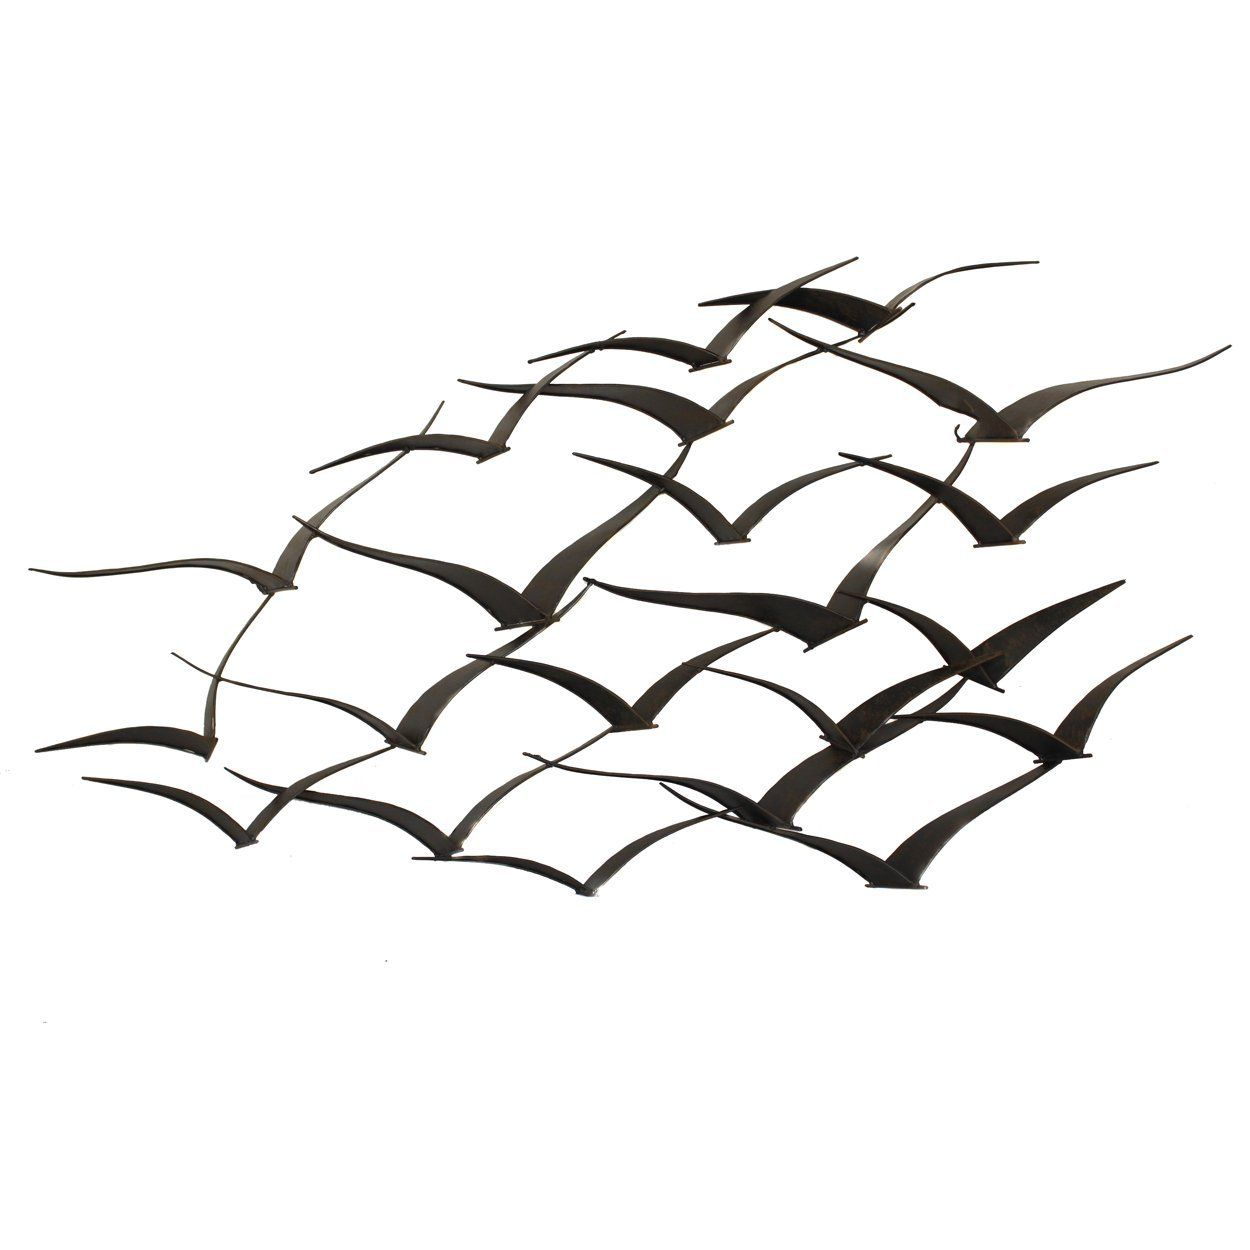 Amazon urban designs handcrafted flock of birds metal wall art